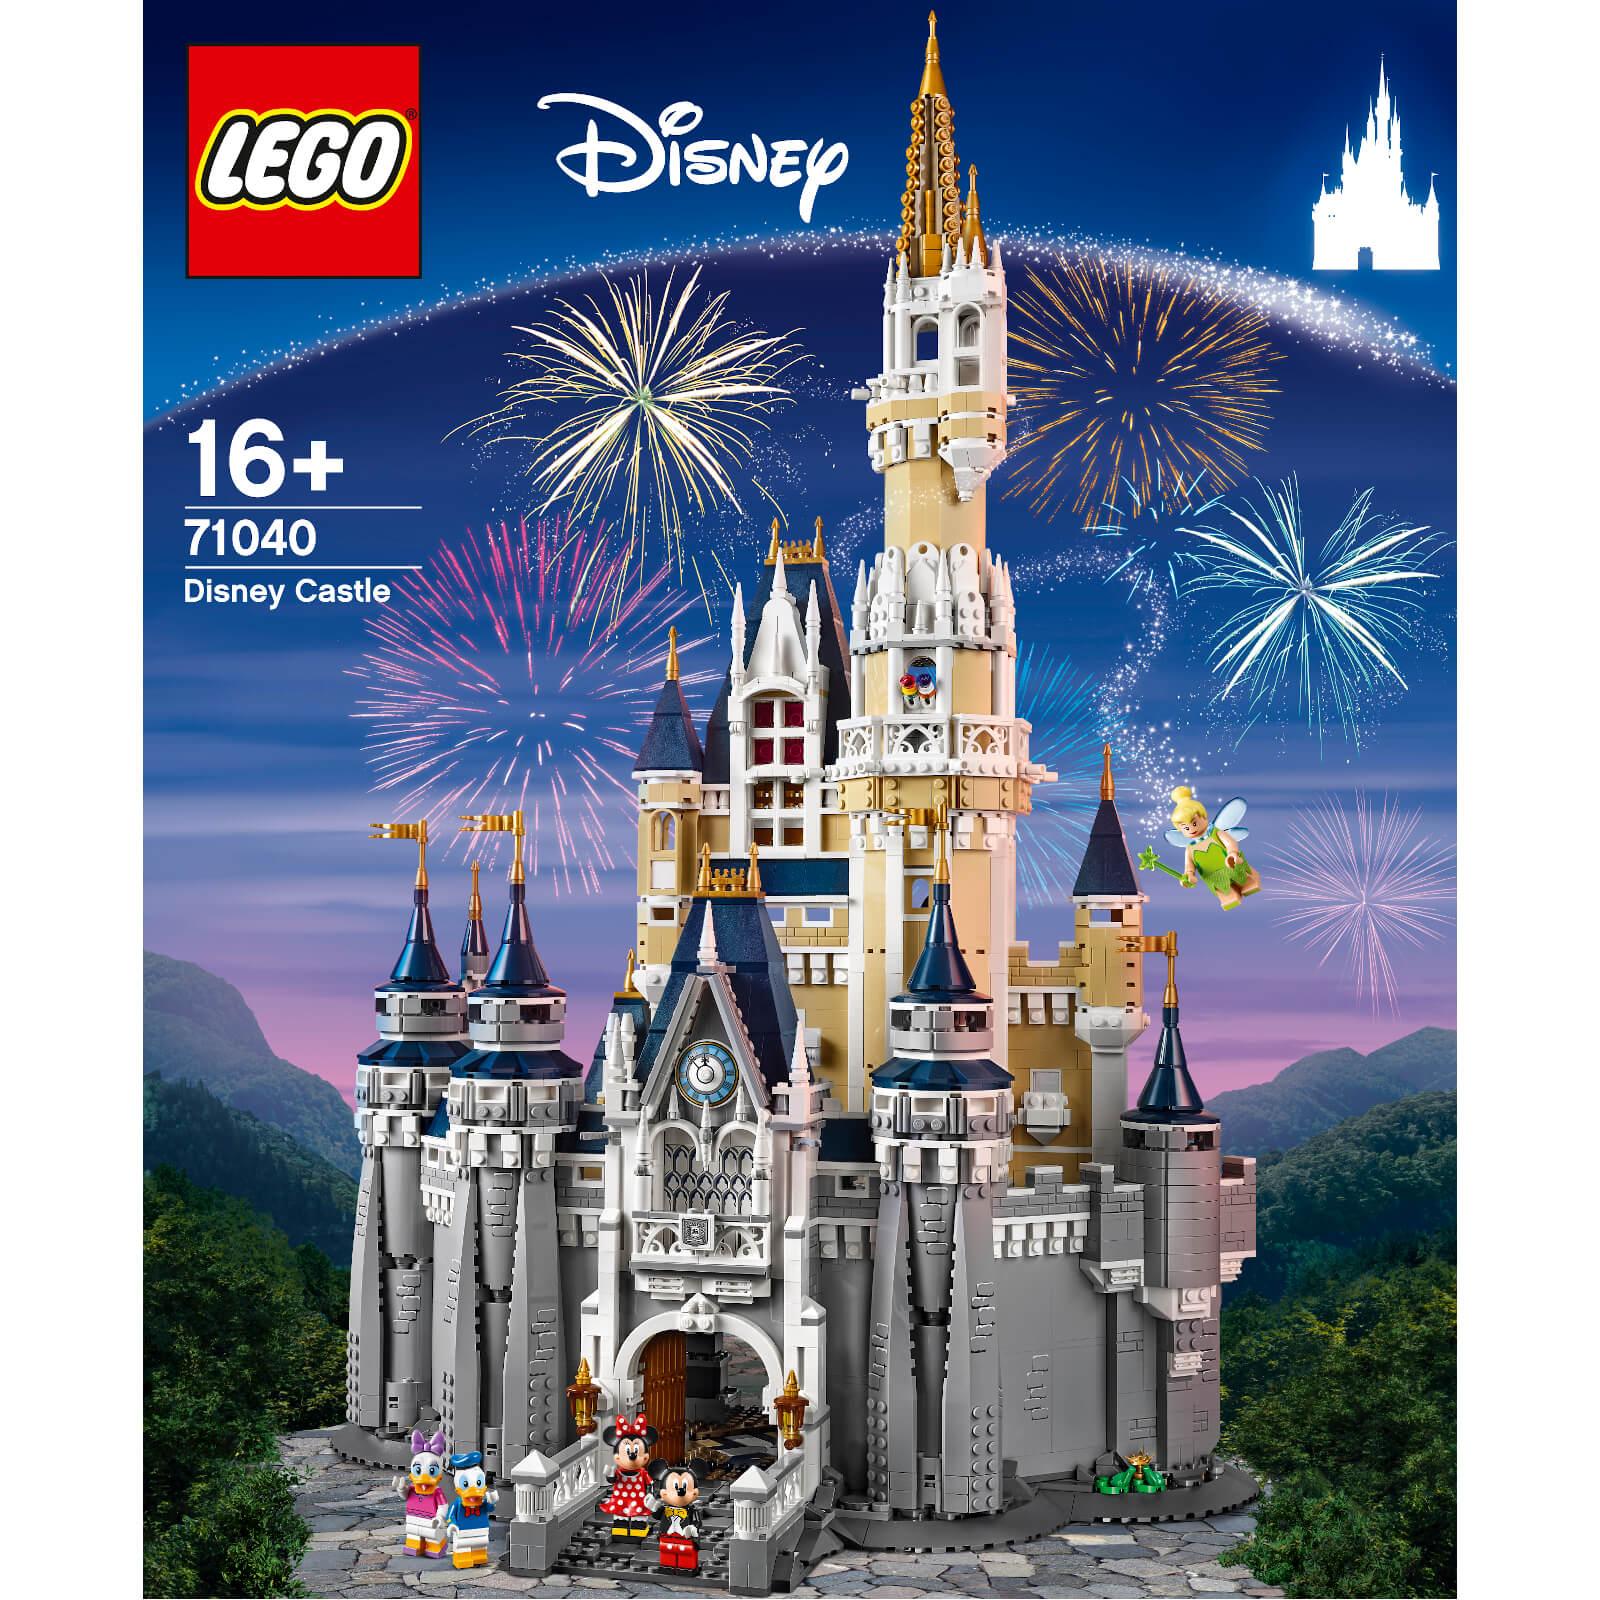 LEGO Disney: The Disney Castle (71040)